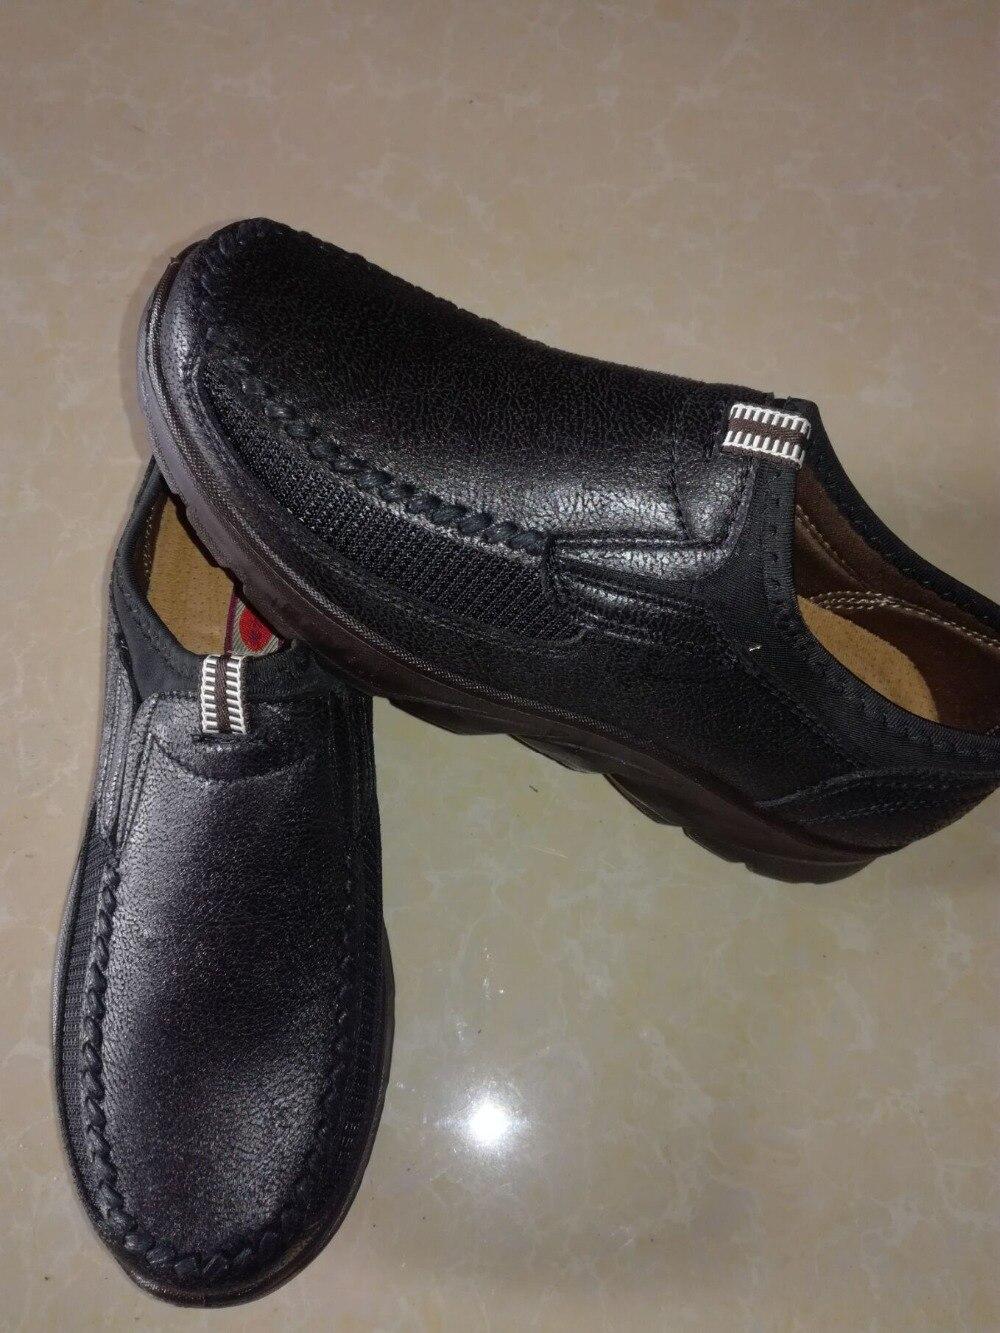 HTB1K0RkPYvpK1RjSZPiq6zmwXXaH Luxury Brand Men Casual Shoes Lightweight Breathable Sneakers Male Walking Shoes Fashion Mesh Zapatillas Footwear Big Szie 38-48